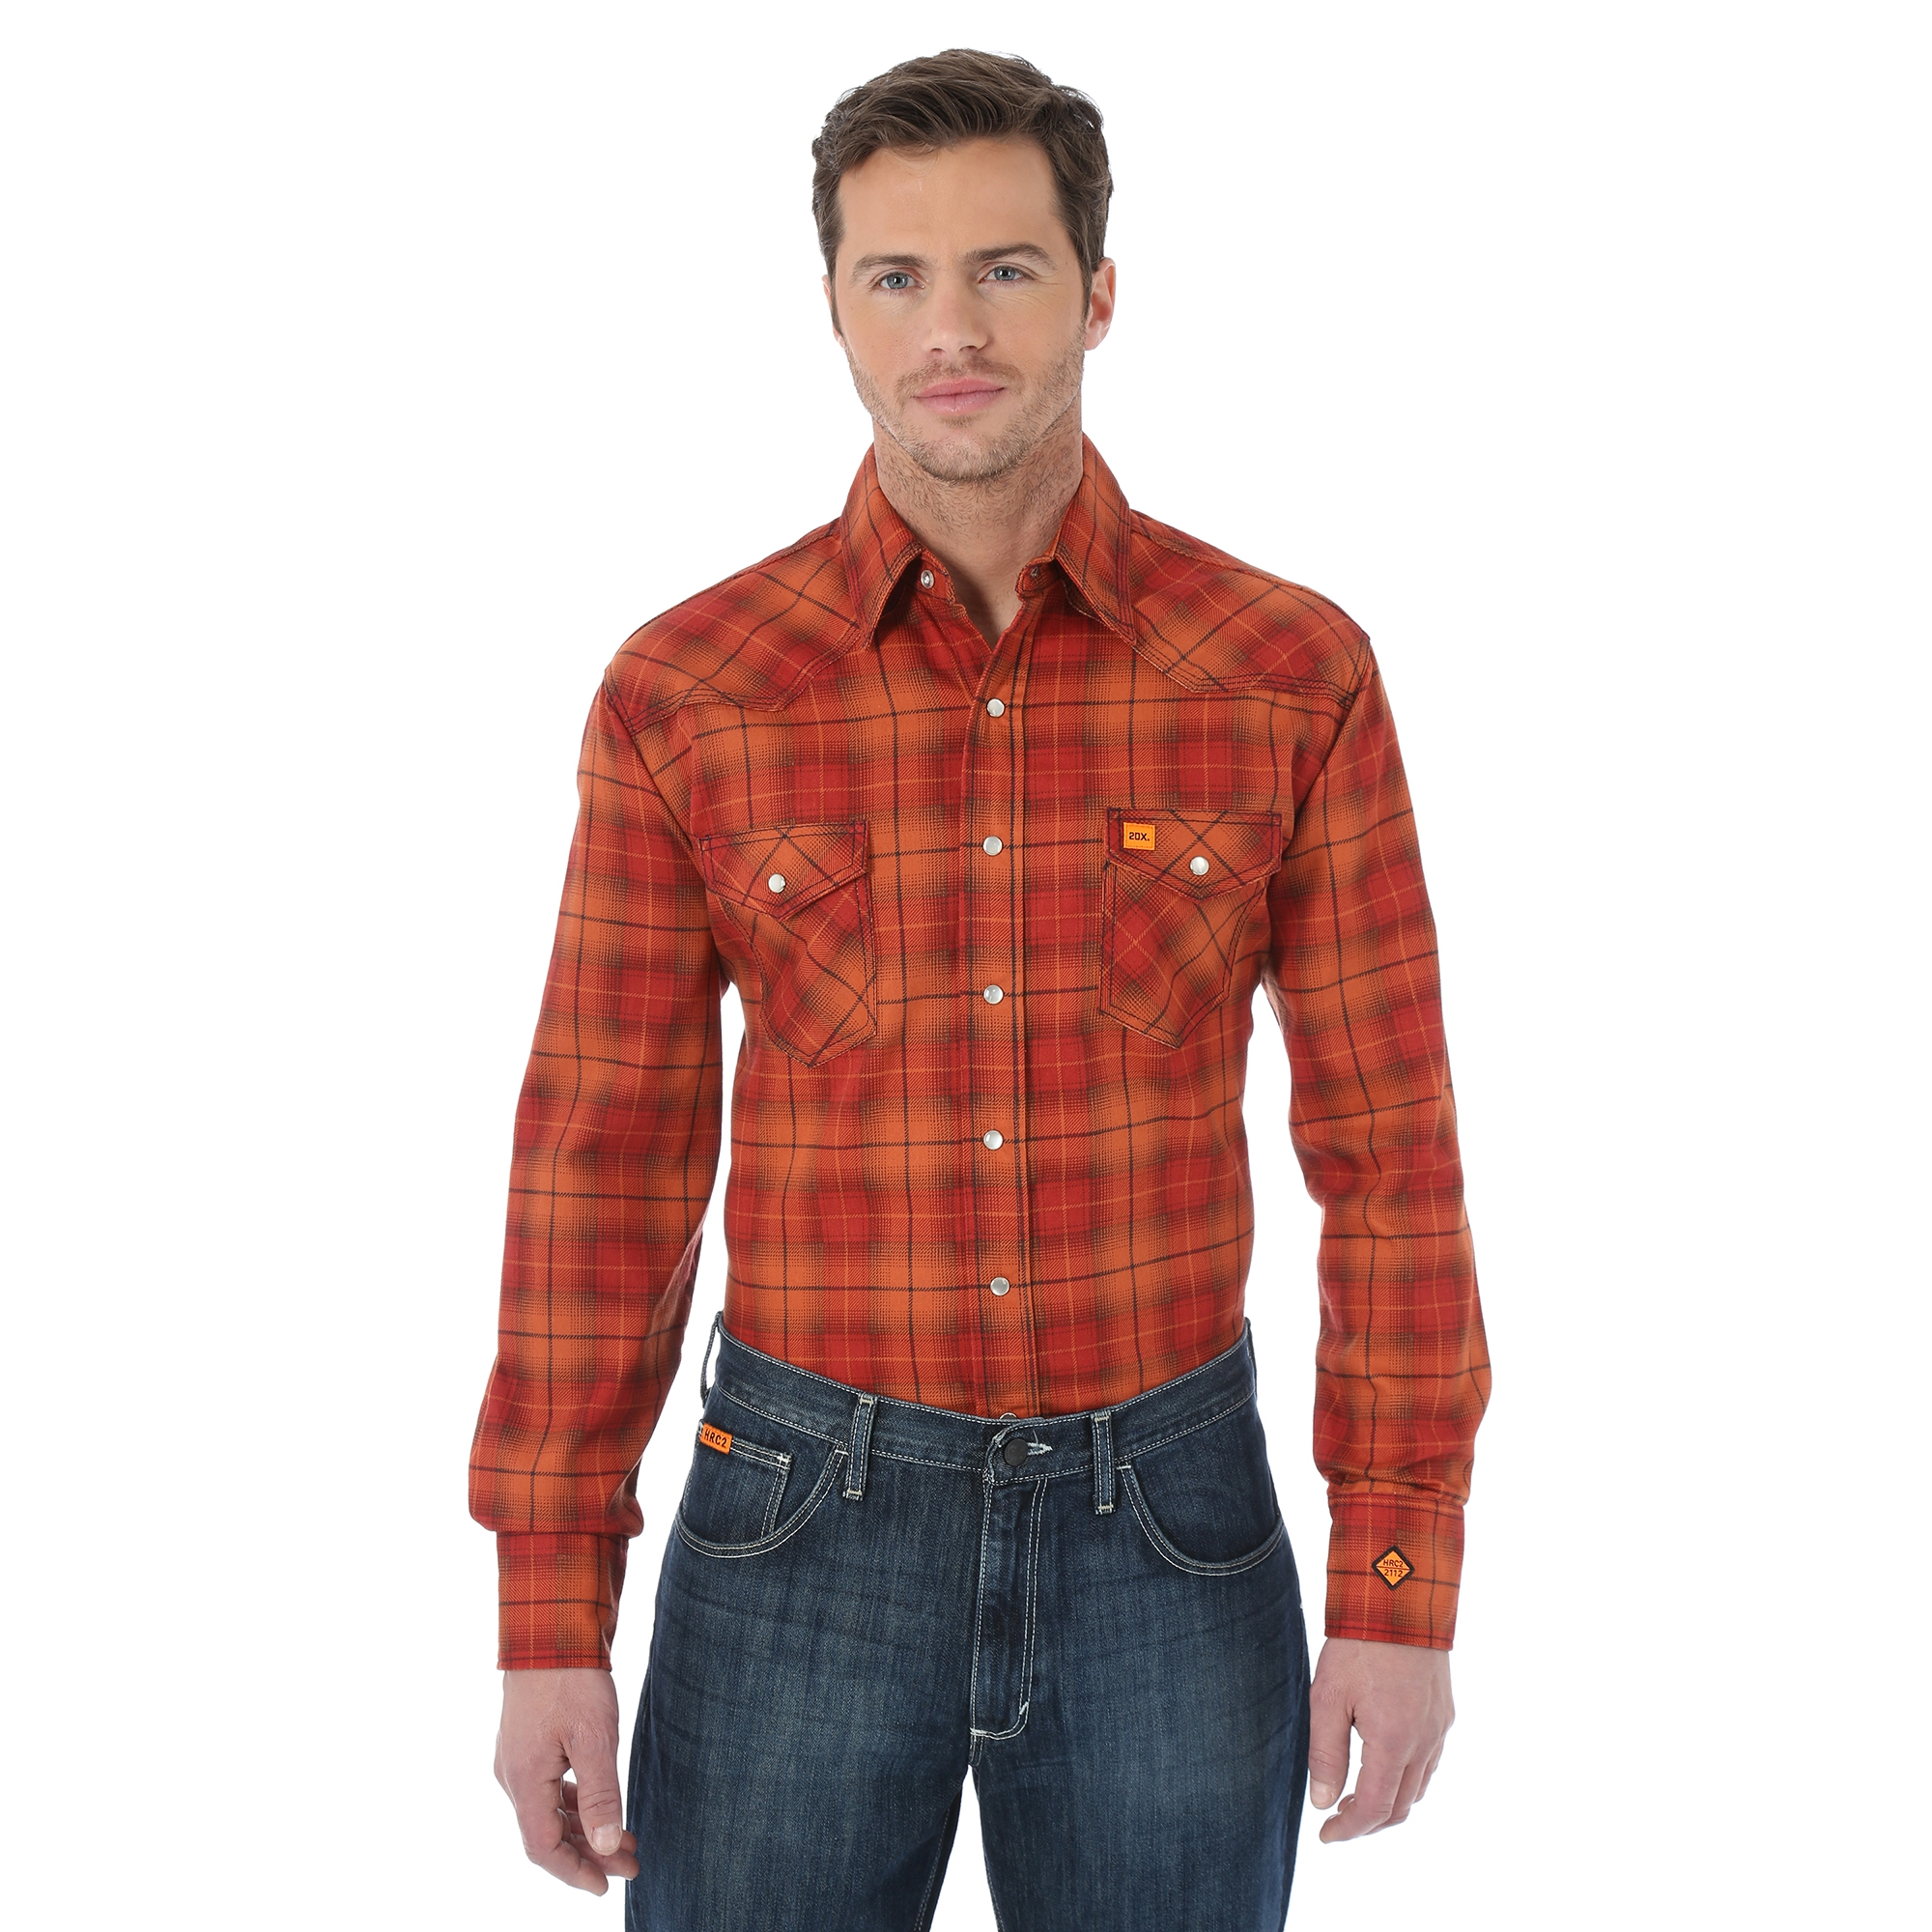 Wrangler Pearl Snap Lightweight Shirt Mettry